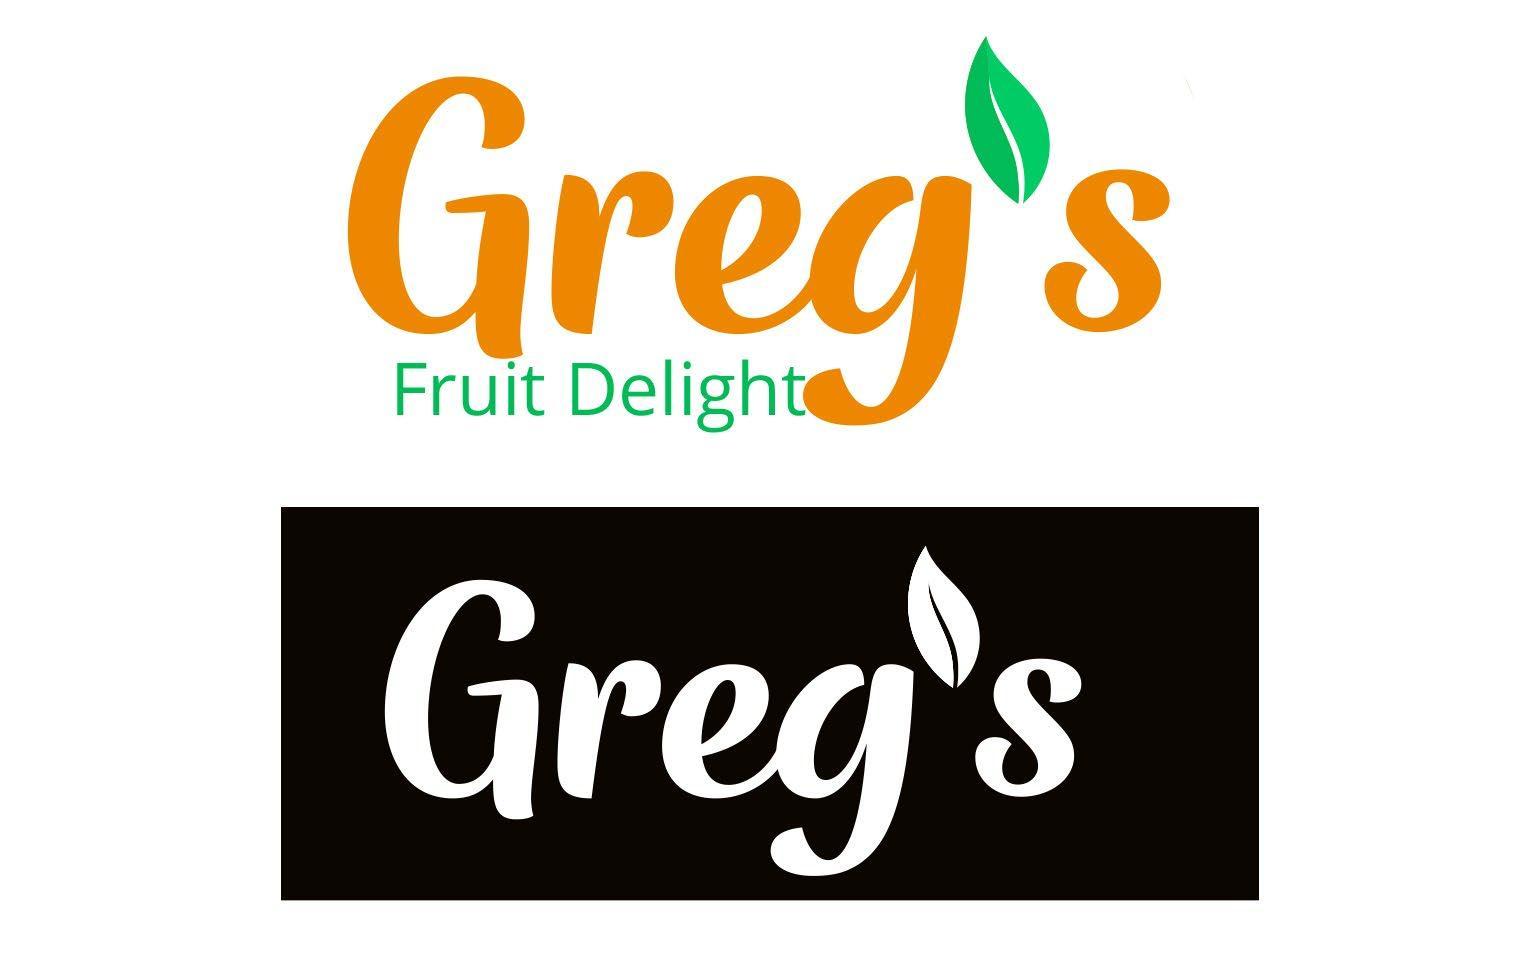 Greg's Fruit Delight logo concepts 1